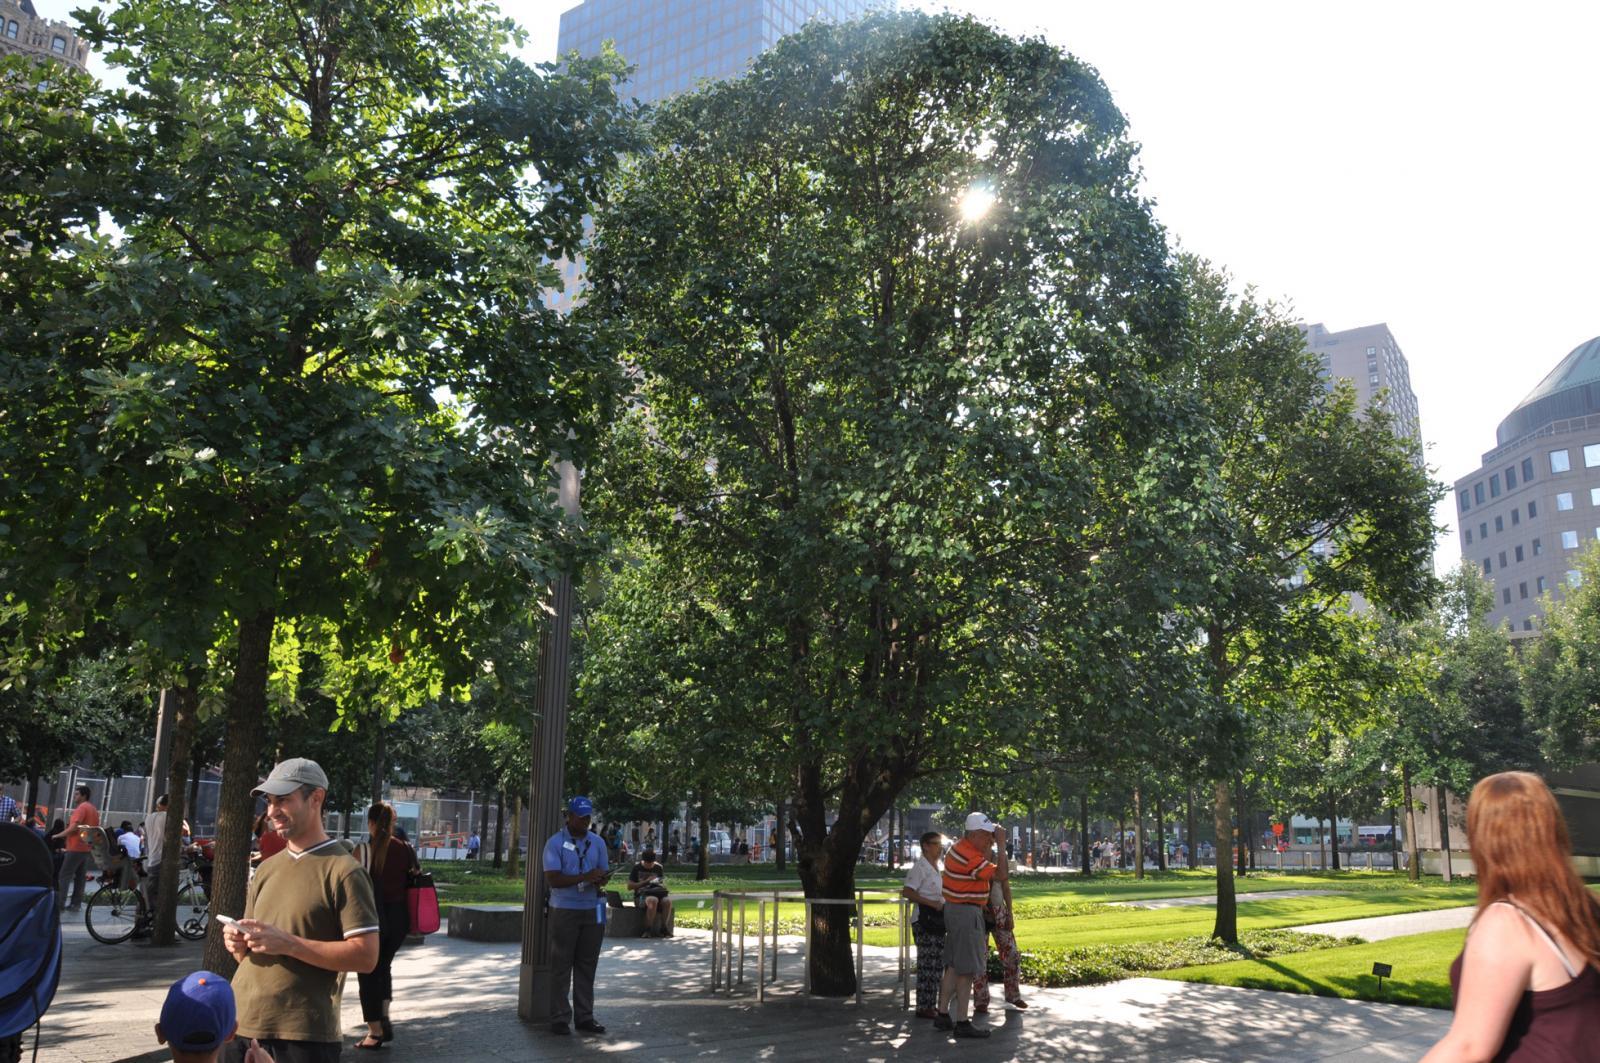 Surviving Tree at 9/11 Memorial